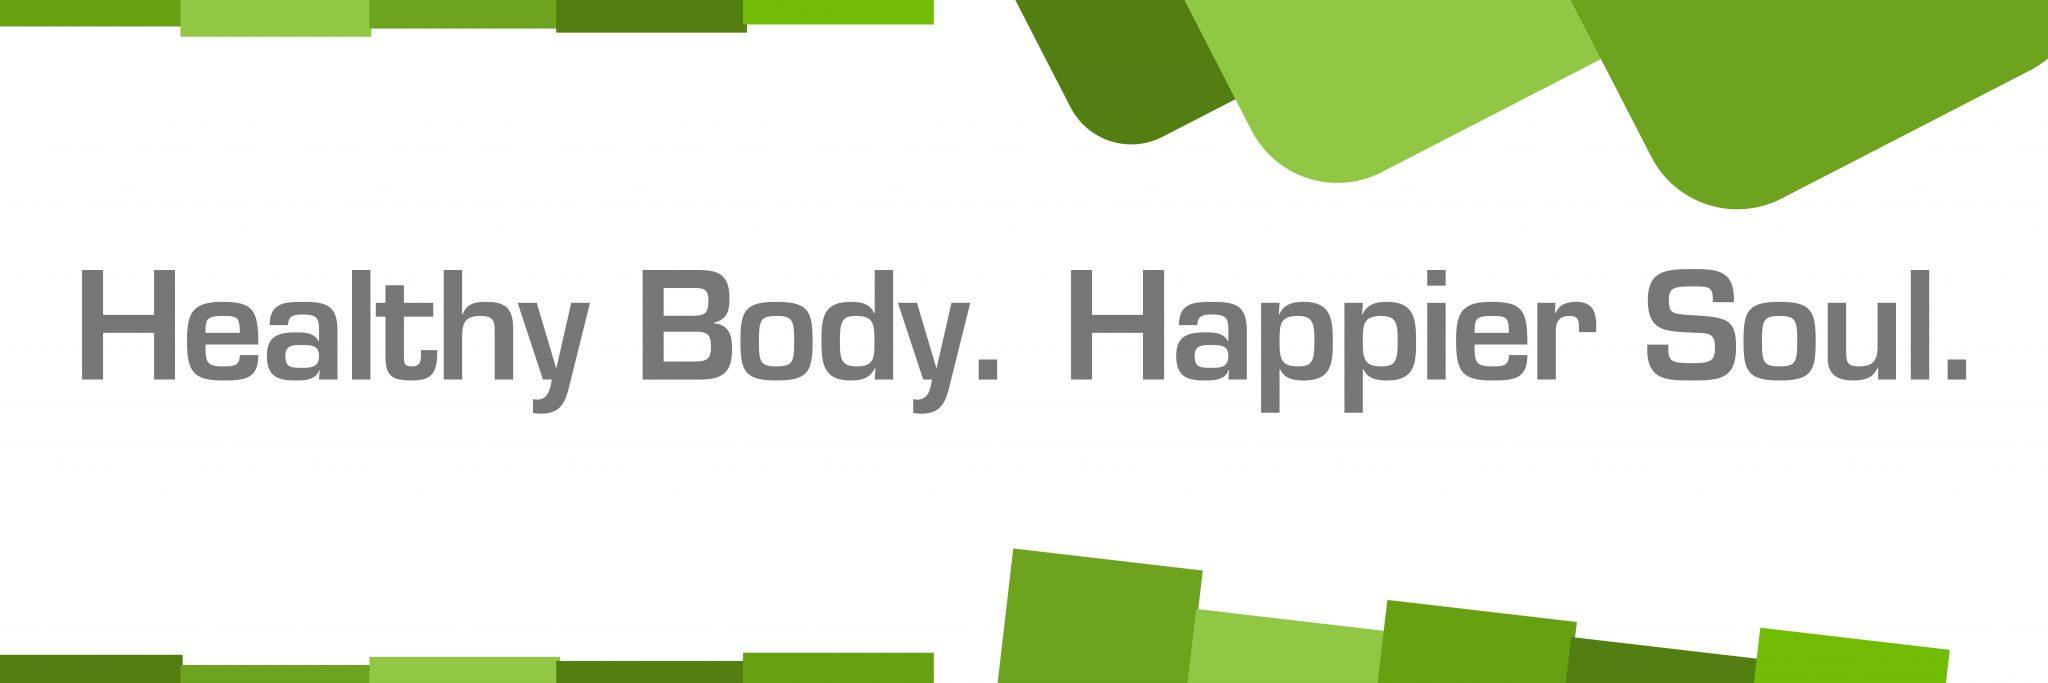 Healthy Body Happier Soul